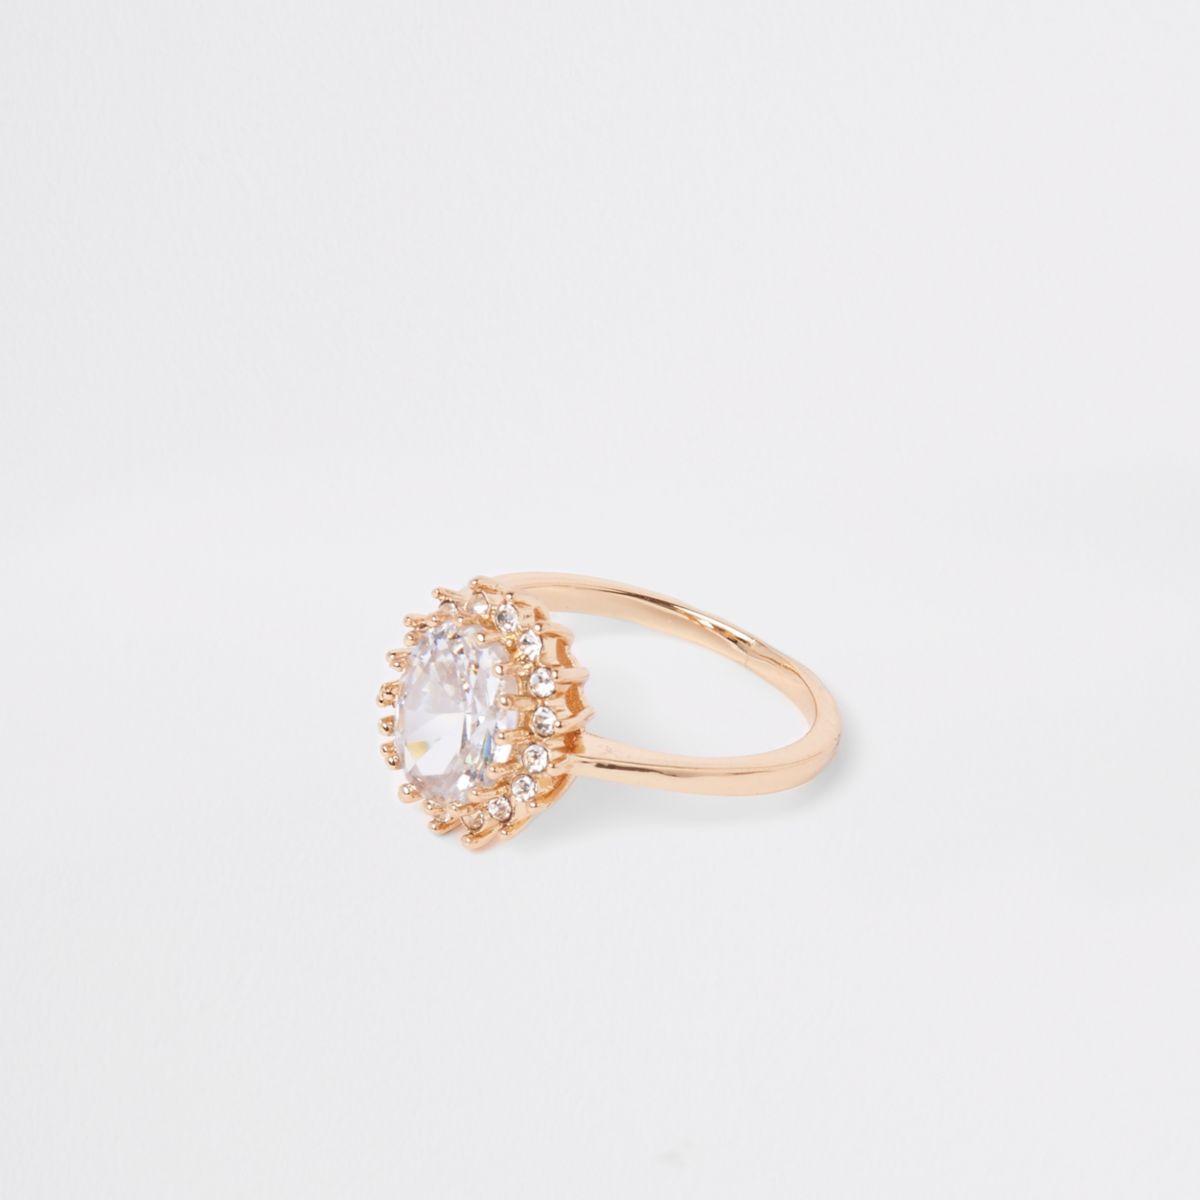 Gold tone jewel stone rhinestone pave ring